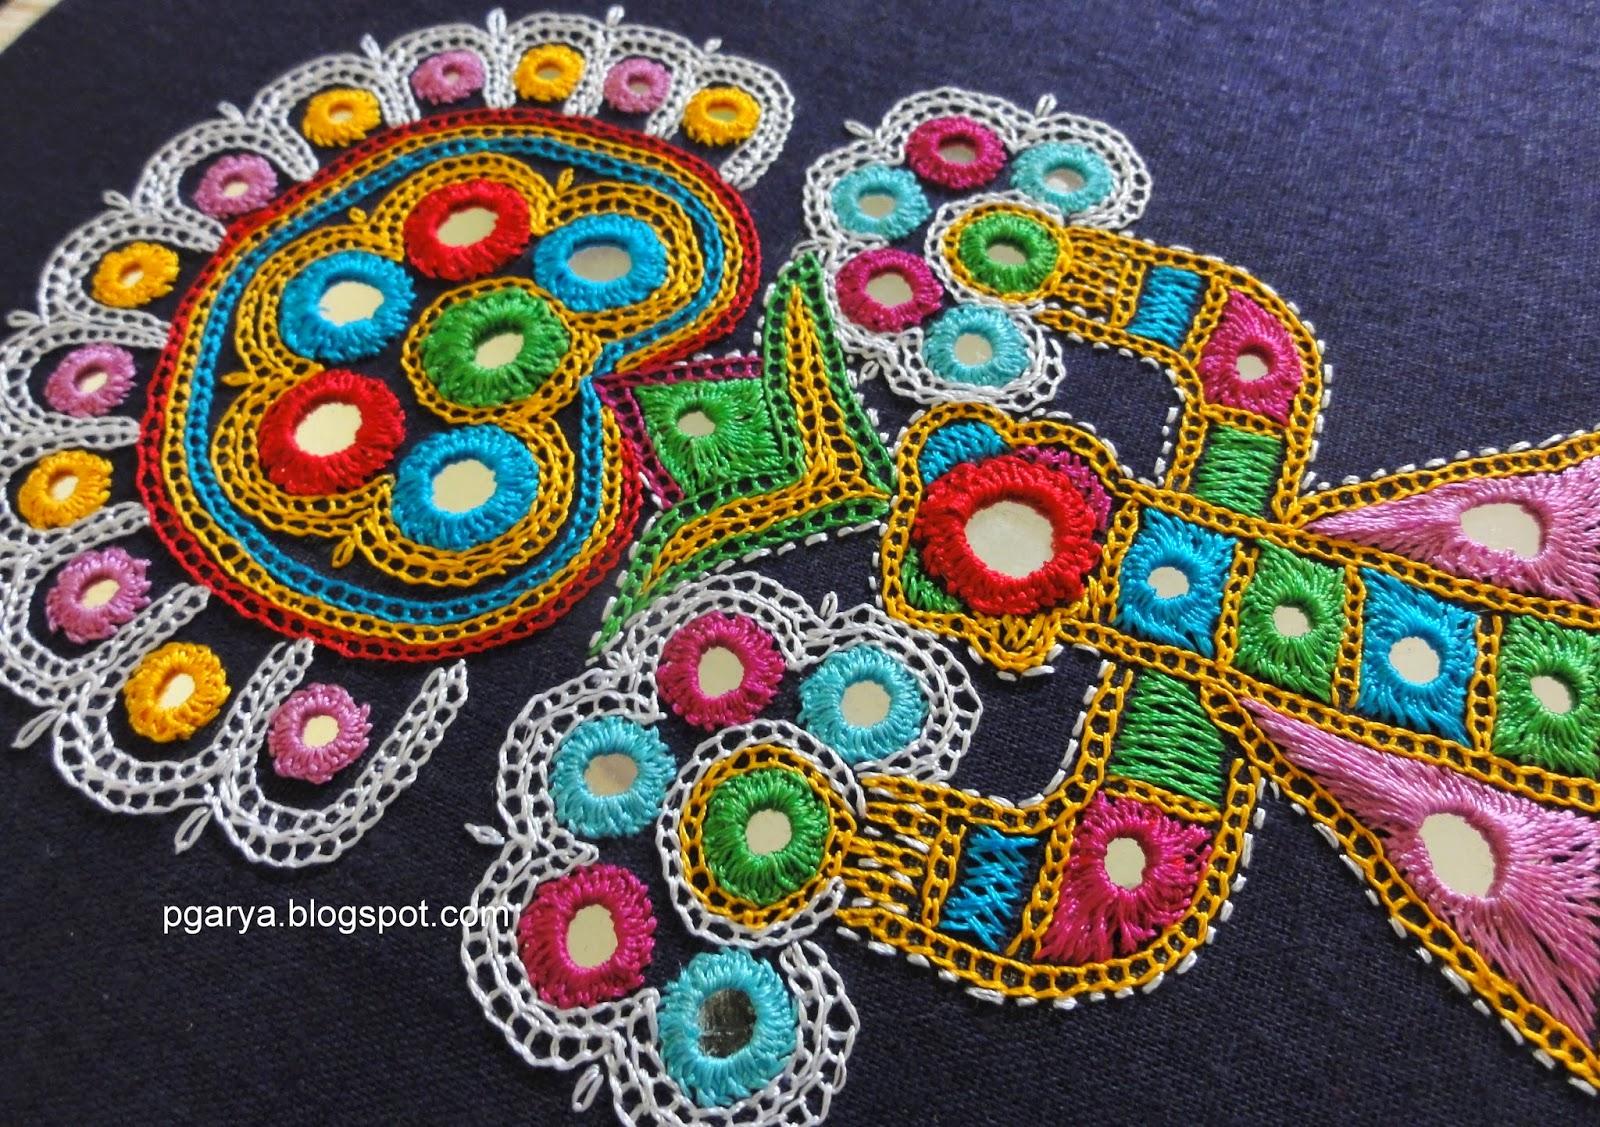 gujarat embroidery motifs